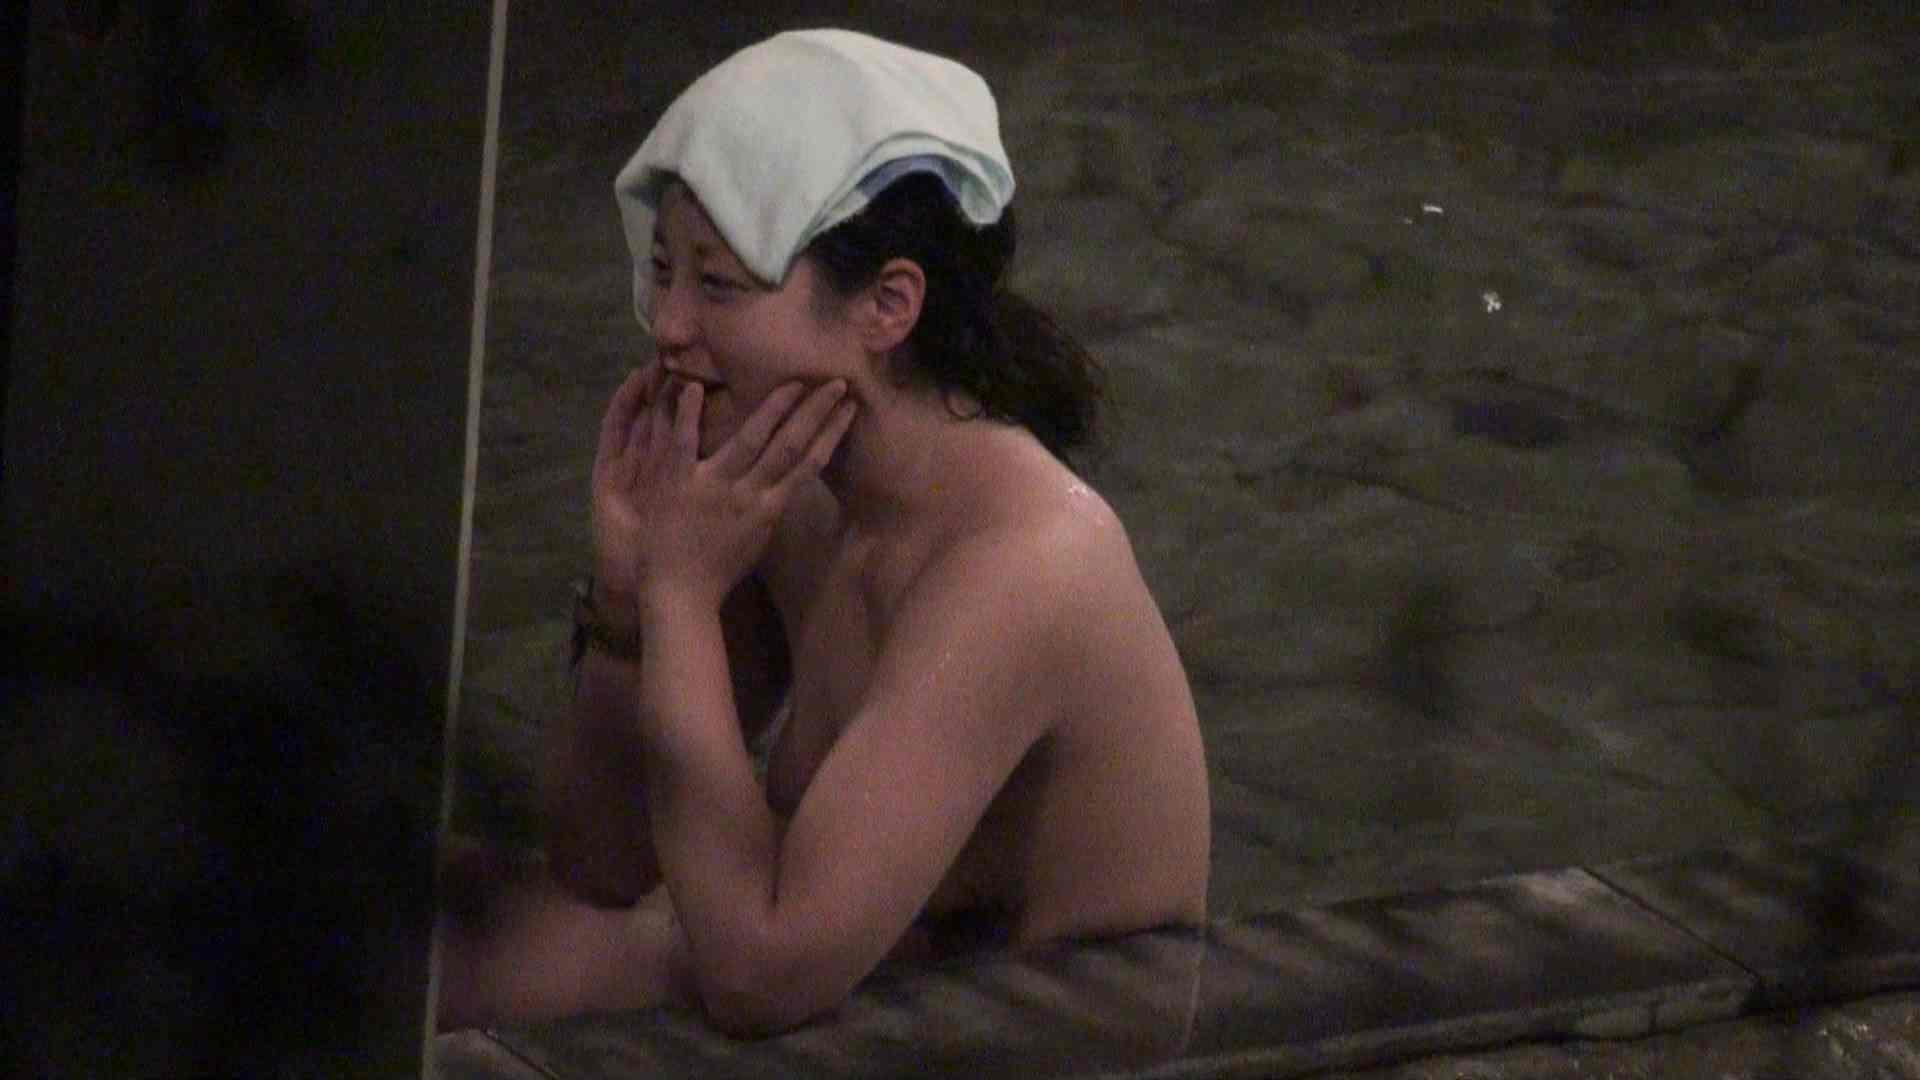 Aquaな露天風呂Vol.397 OL女体 アダルト動画キャプチャ 39連発 26